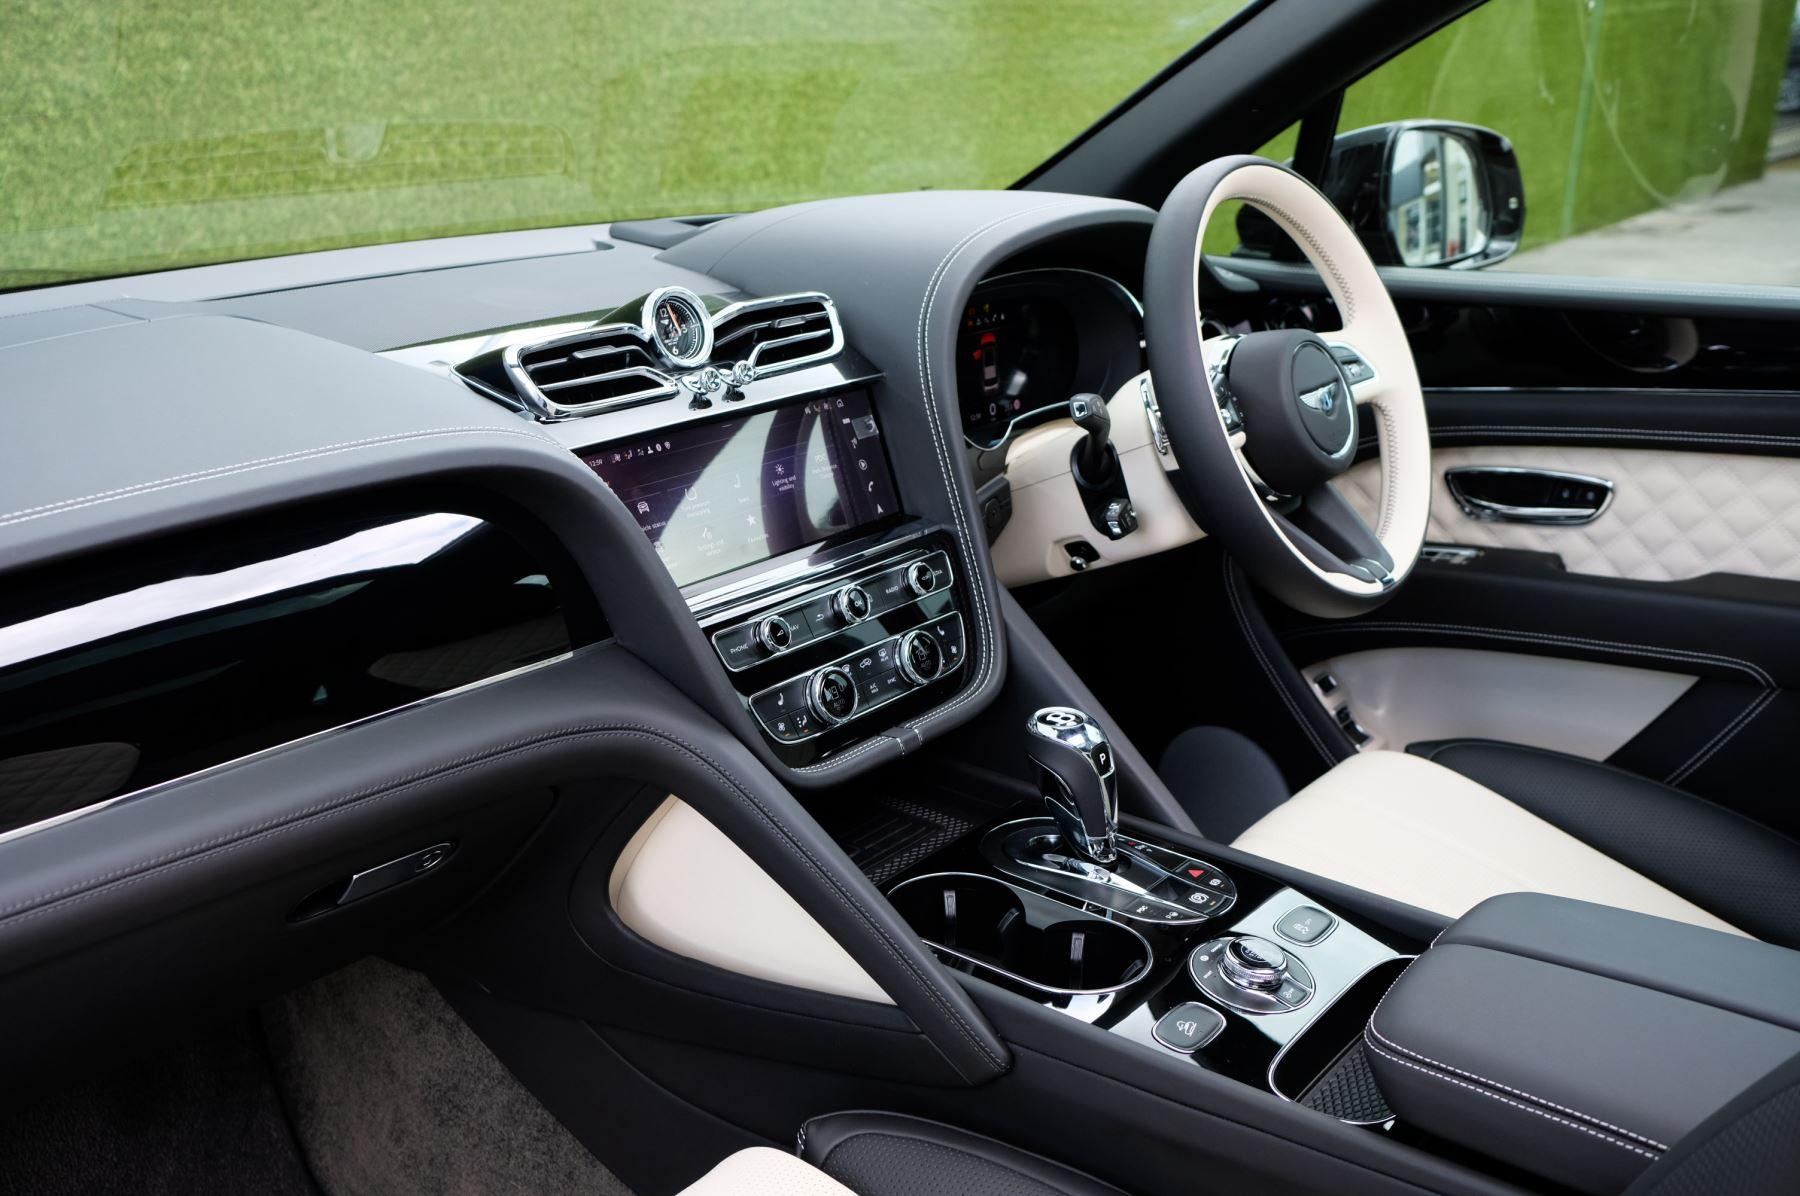 Bentley Bentayga 4.0 V8 - Mulliner Driving Specification for Black Specification image 11